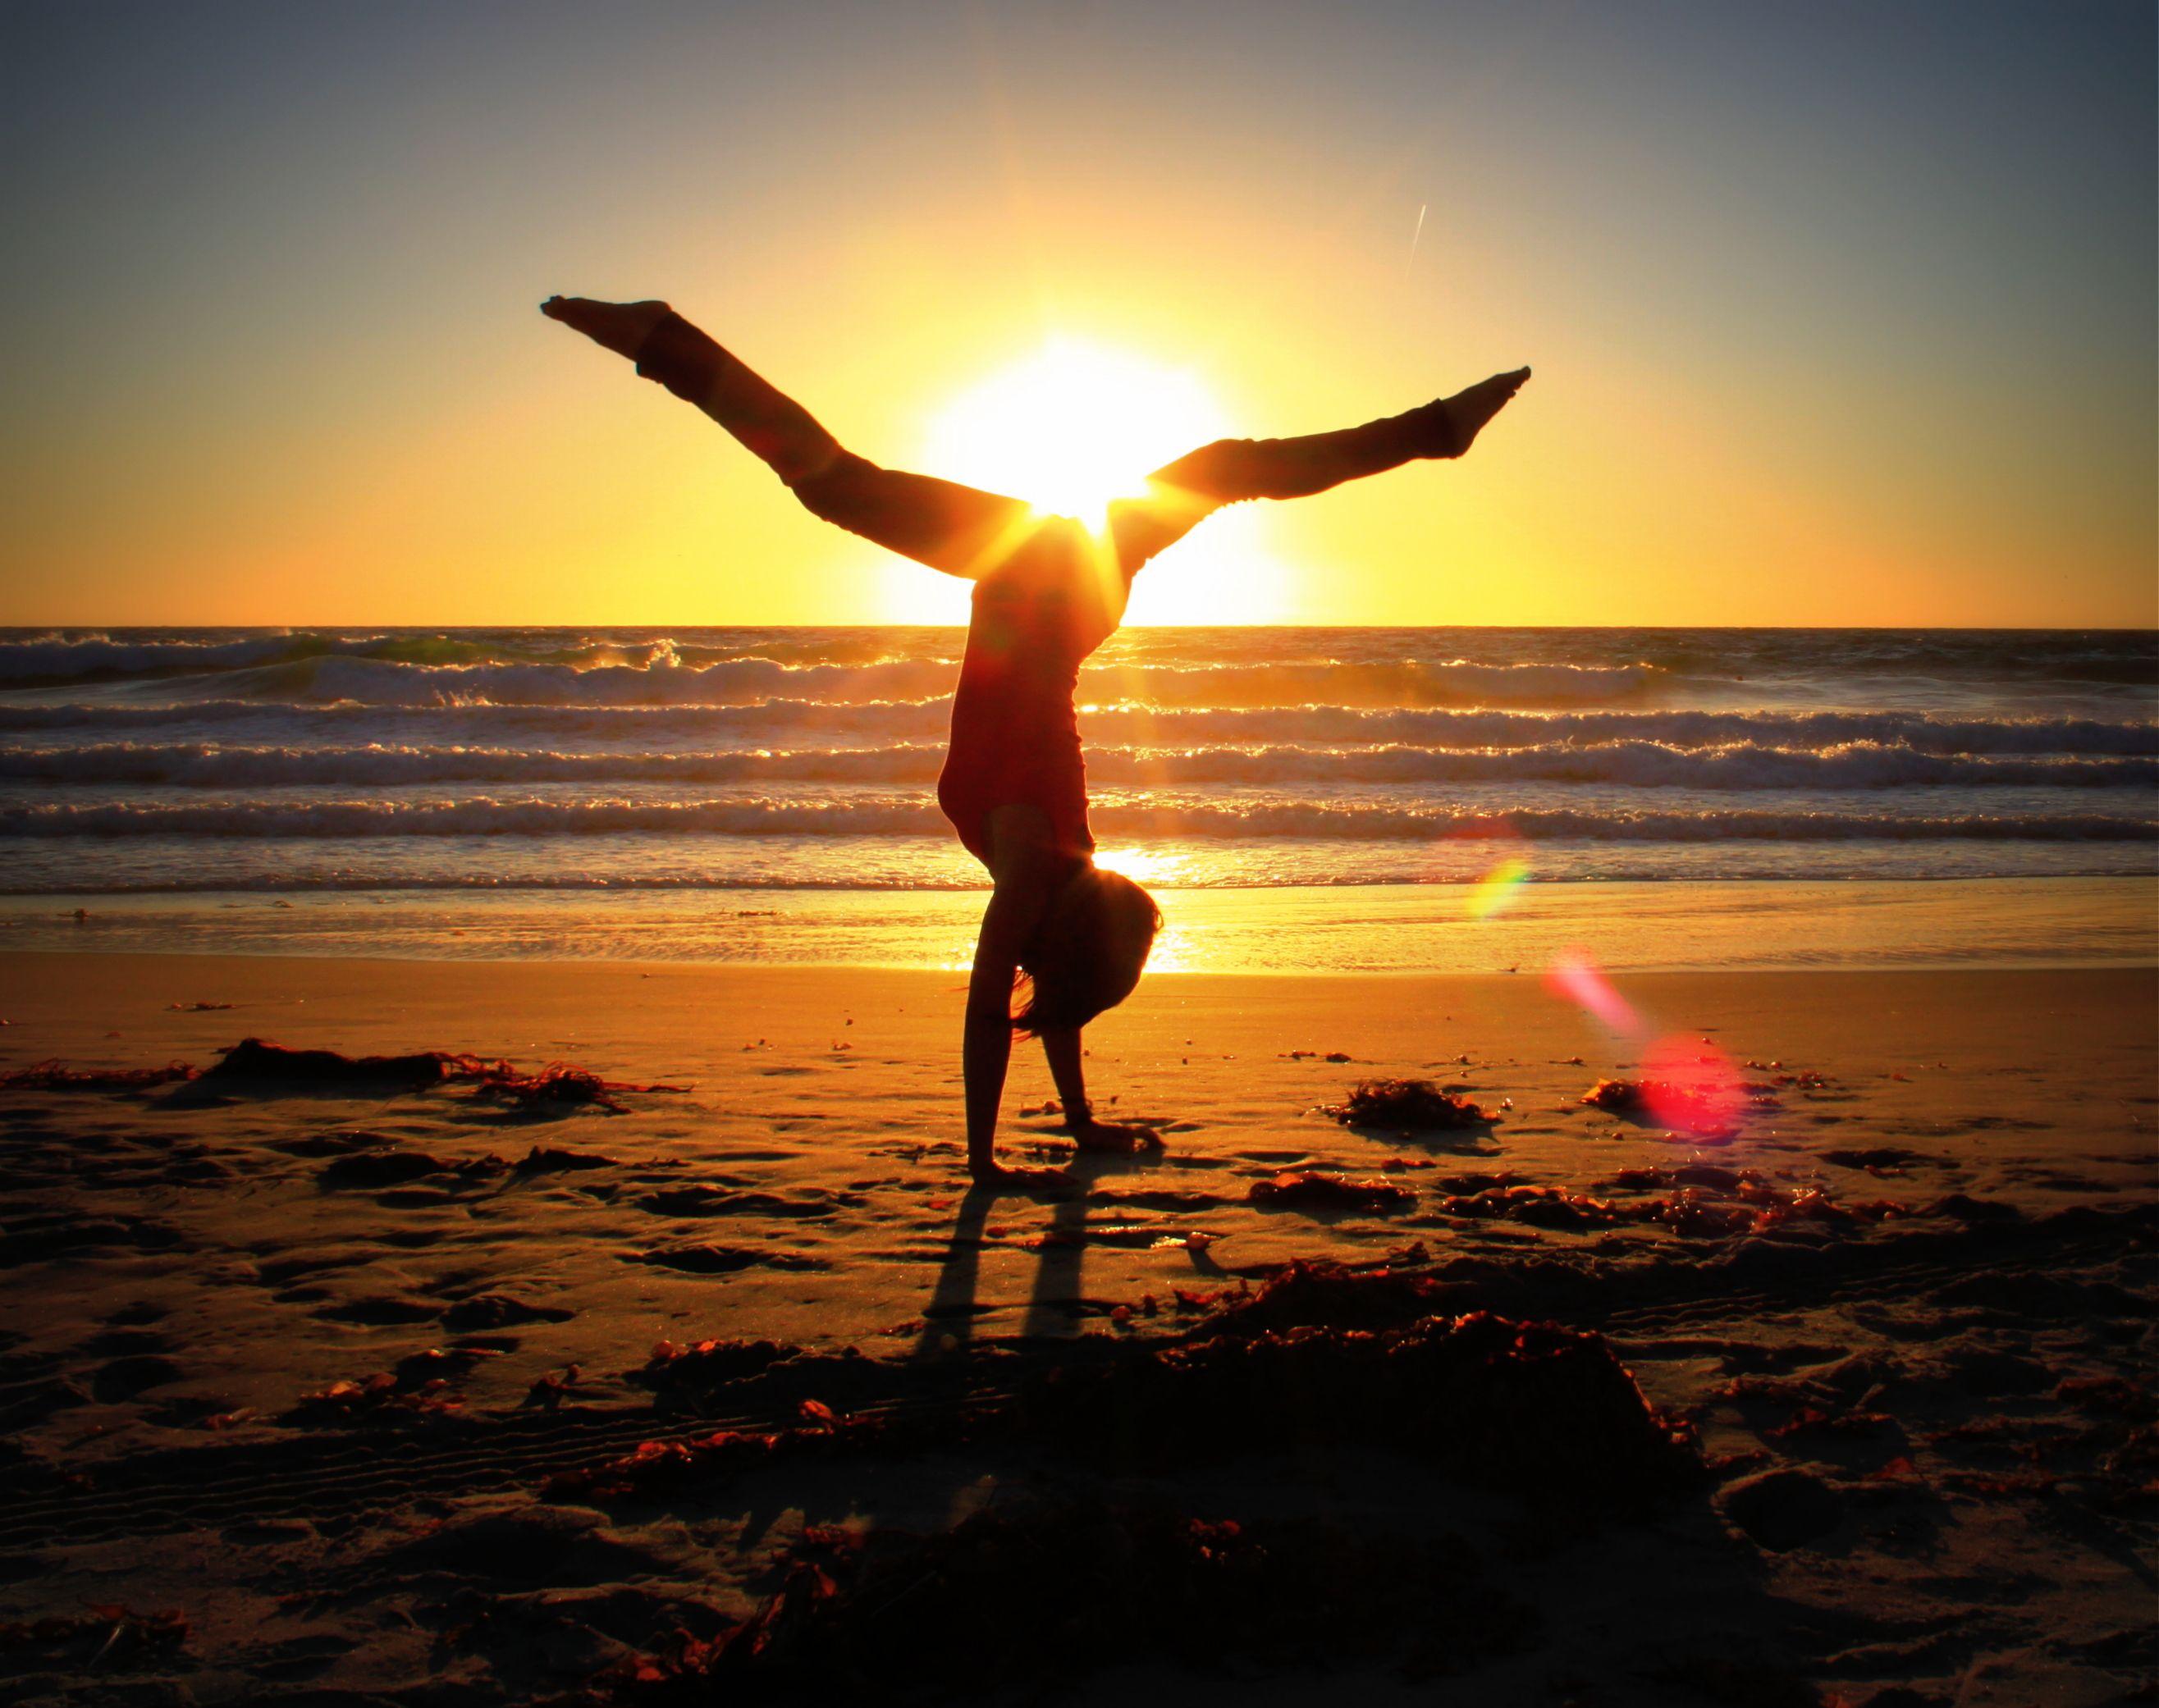 yoga on the beach, girl handstand sunset | Yoga not yoda ...